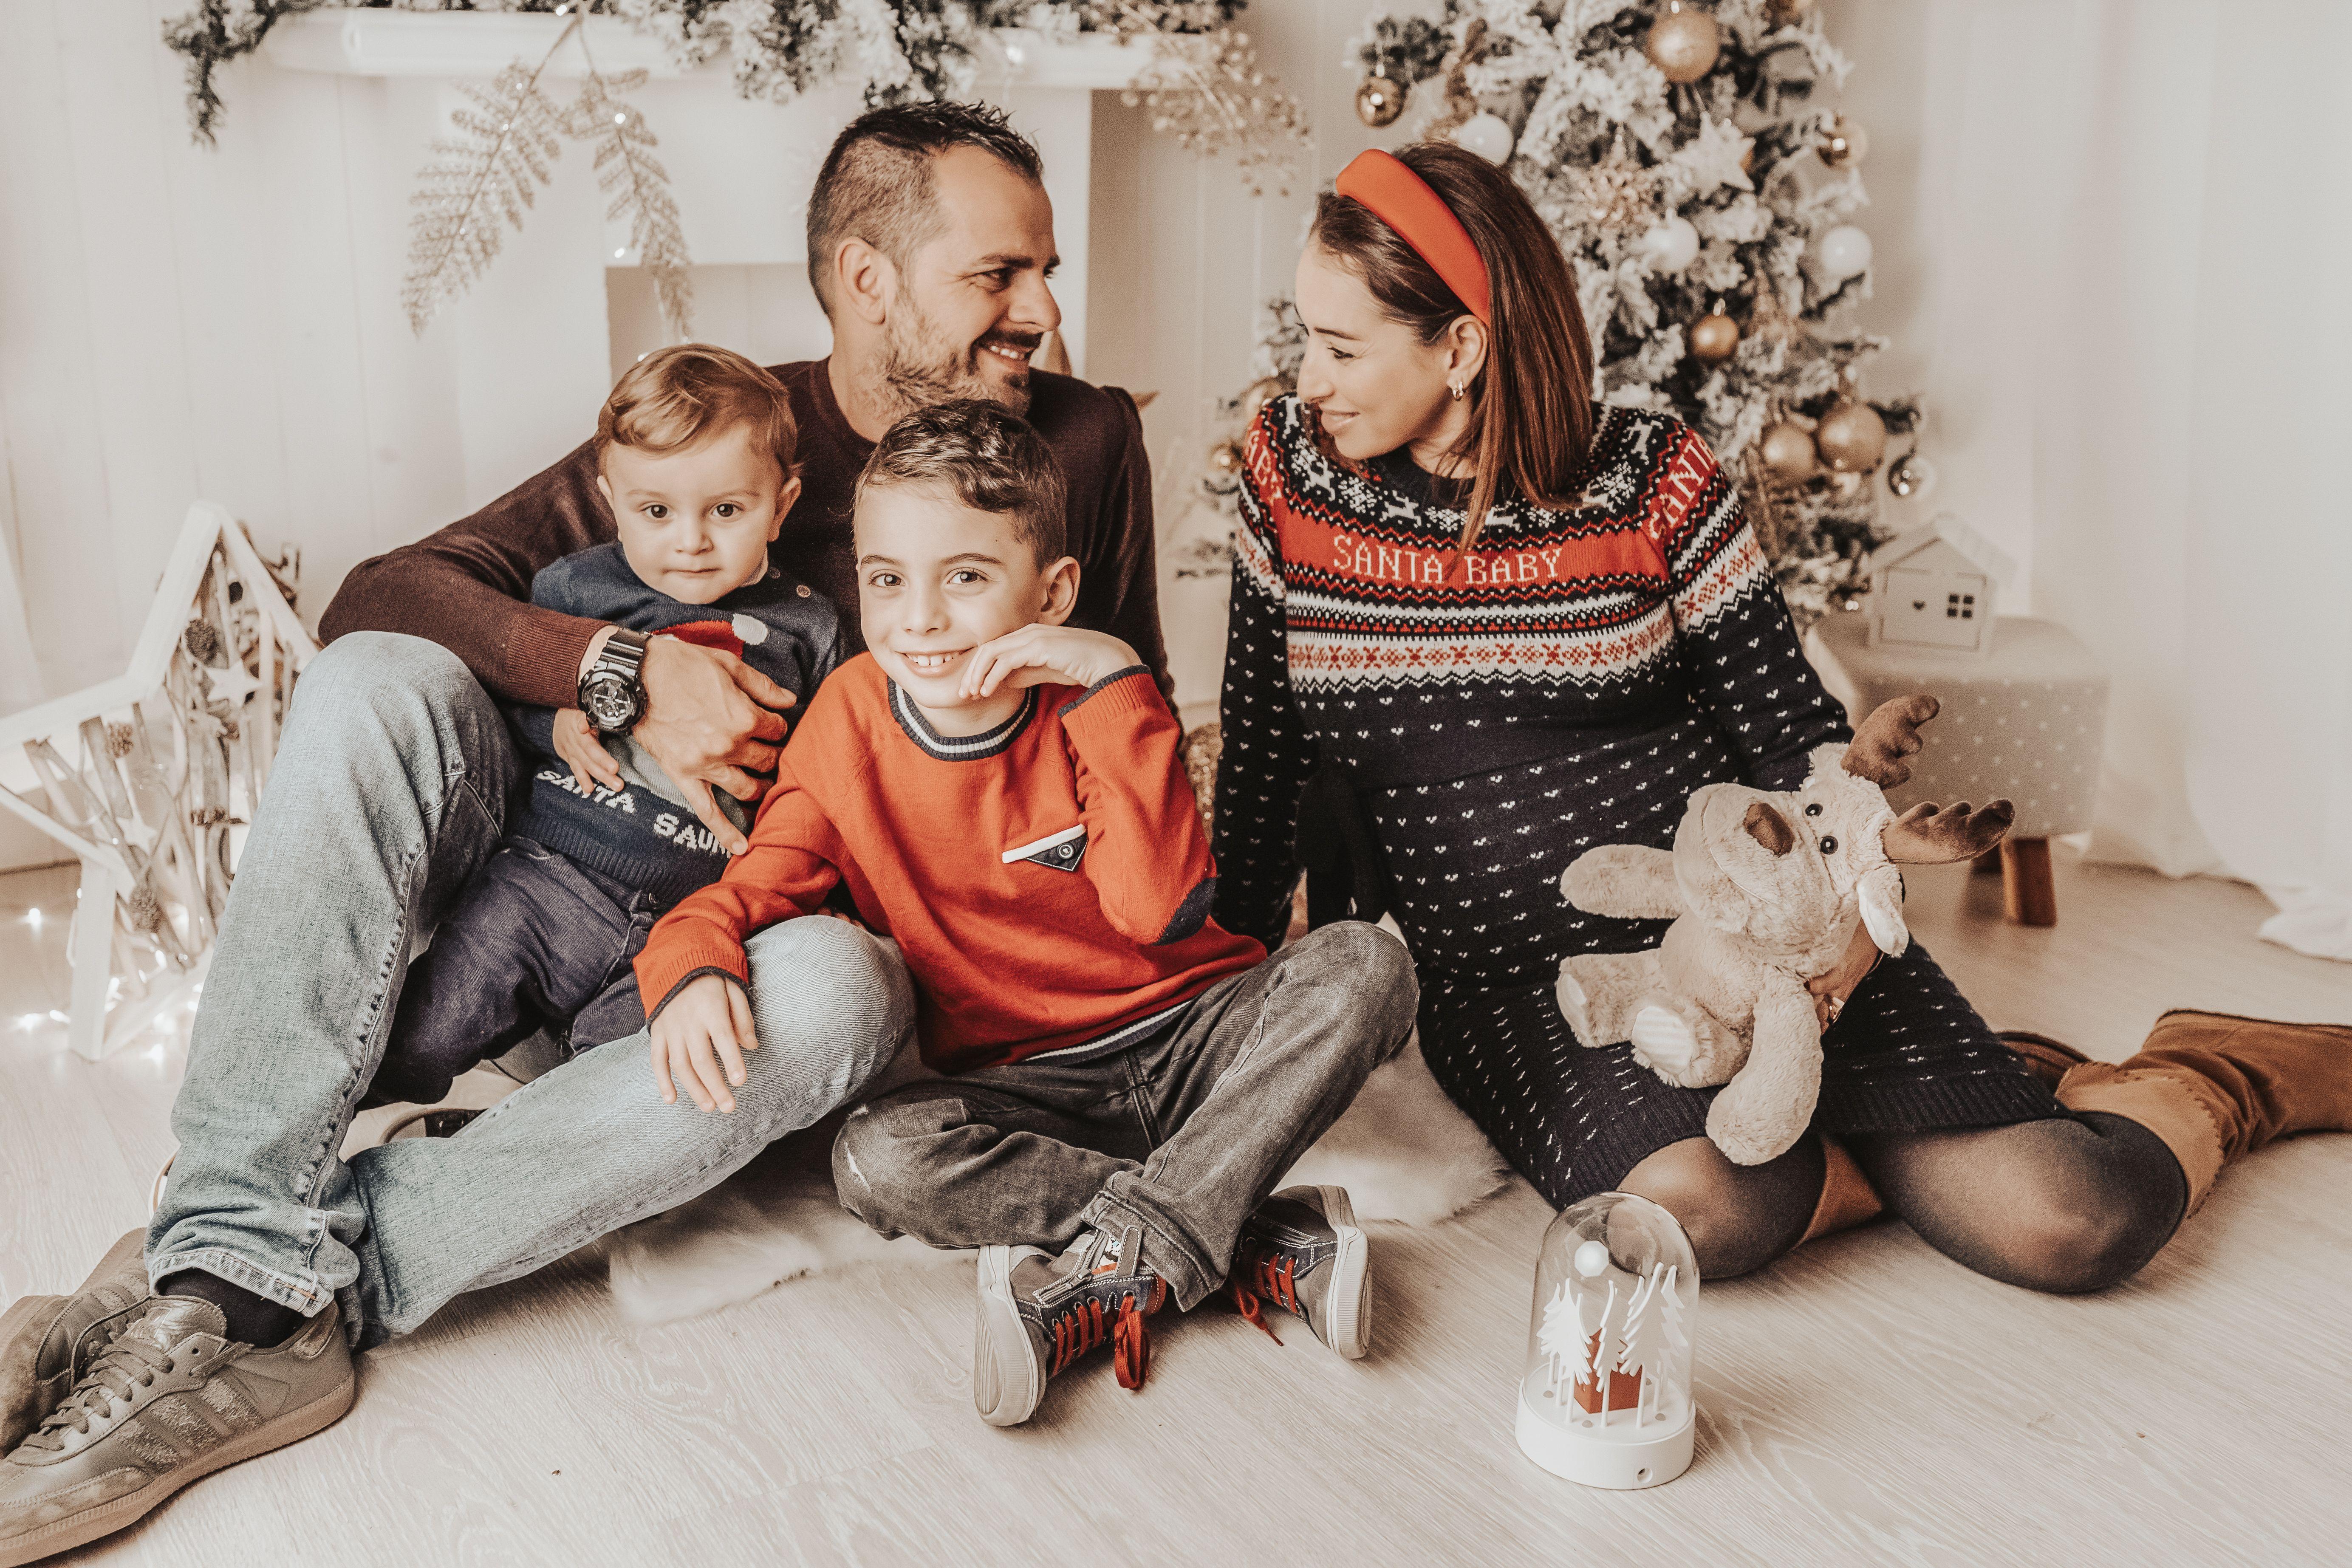 #christmaseve #christmas #familyphotography #familygoals